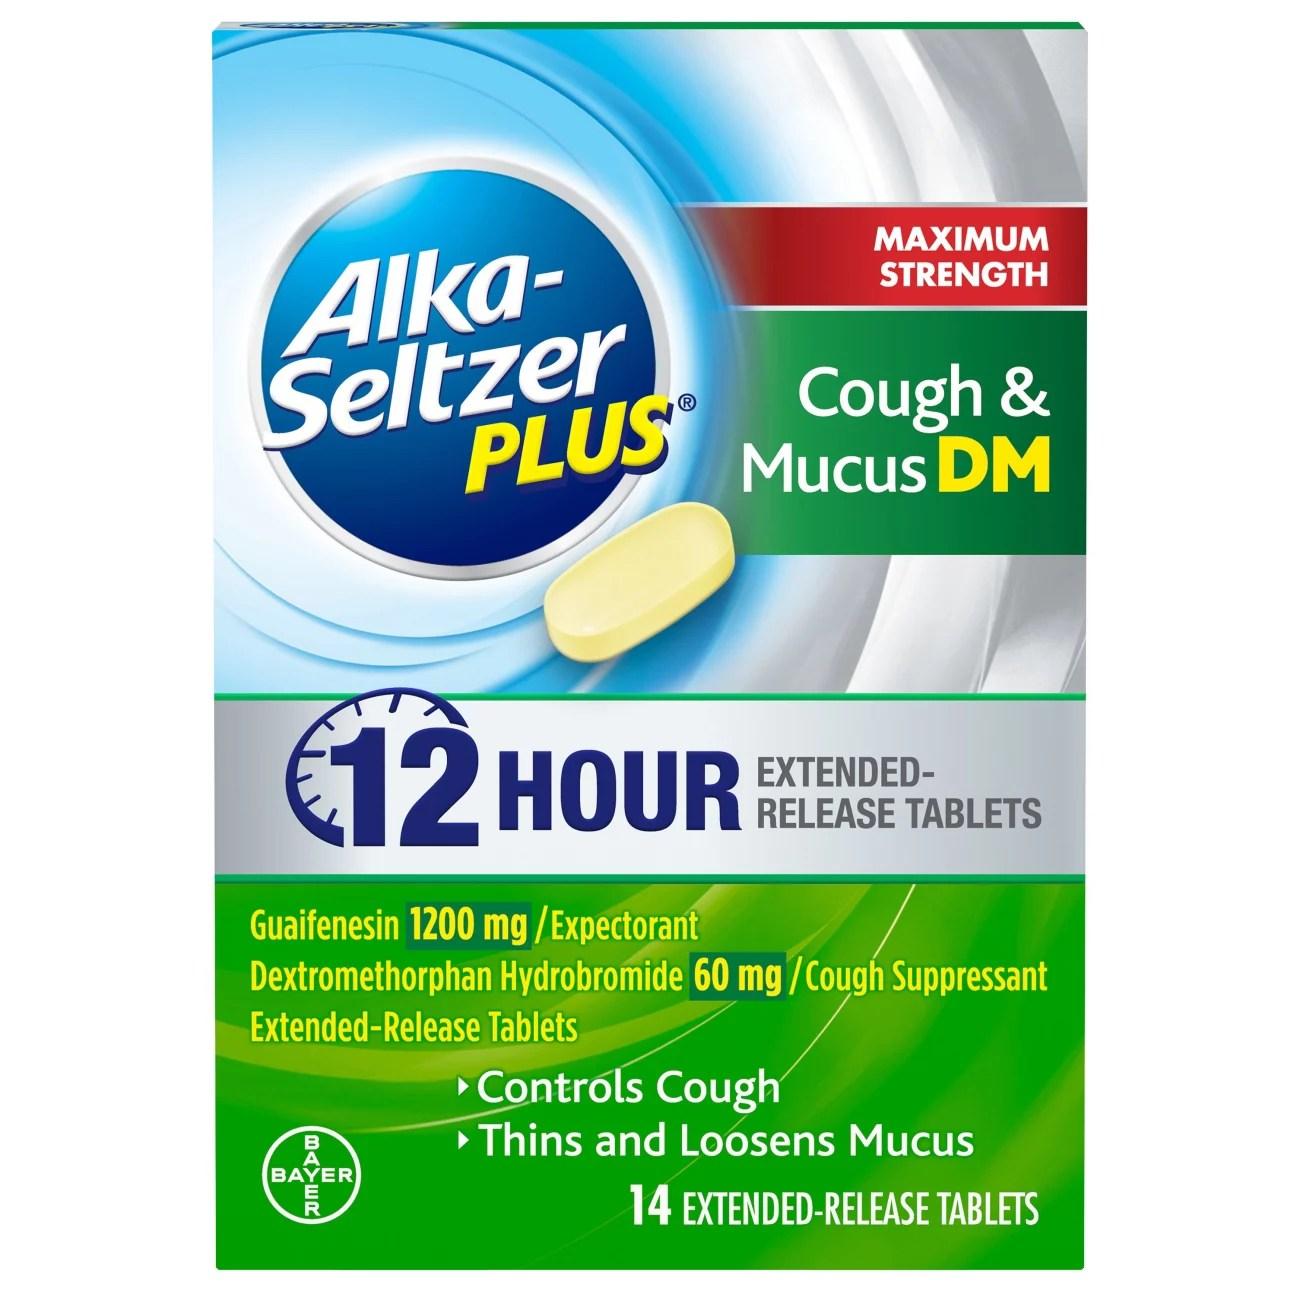 Alka-Seltzer Plus Maximum Strength Cough & Mucus DM - Shop ...